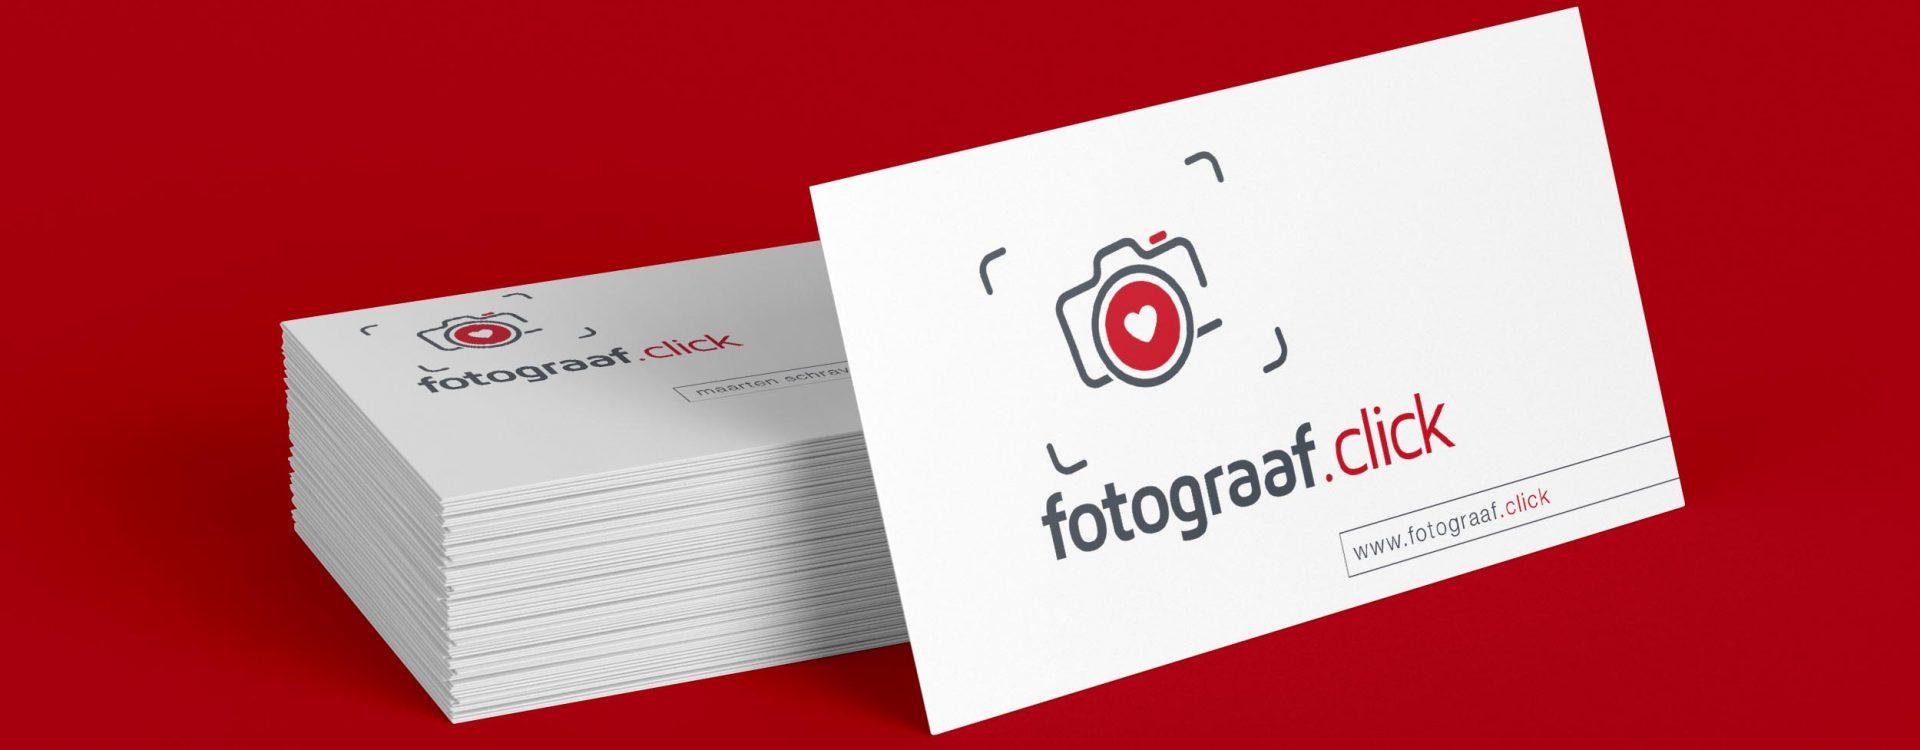 Visitekaartjes va fotograaf.click